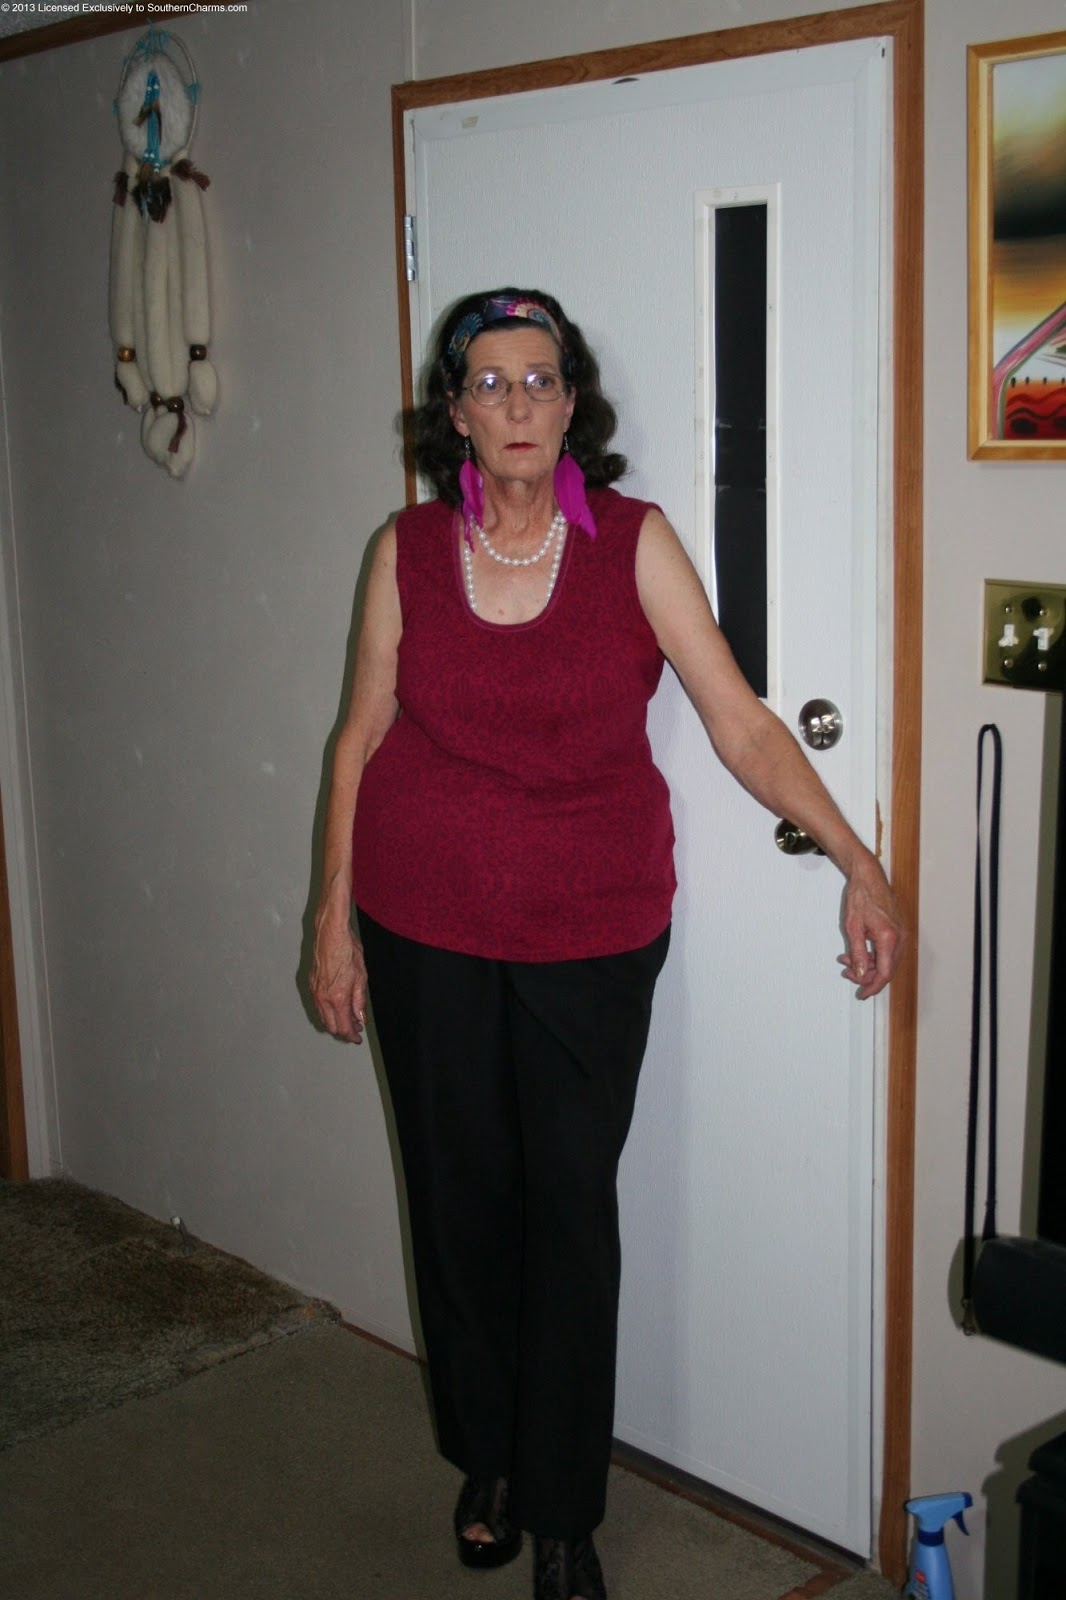 Backup Older Women Archive Photo Sets 6-1210